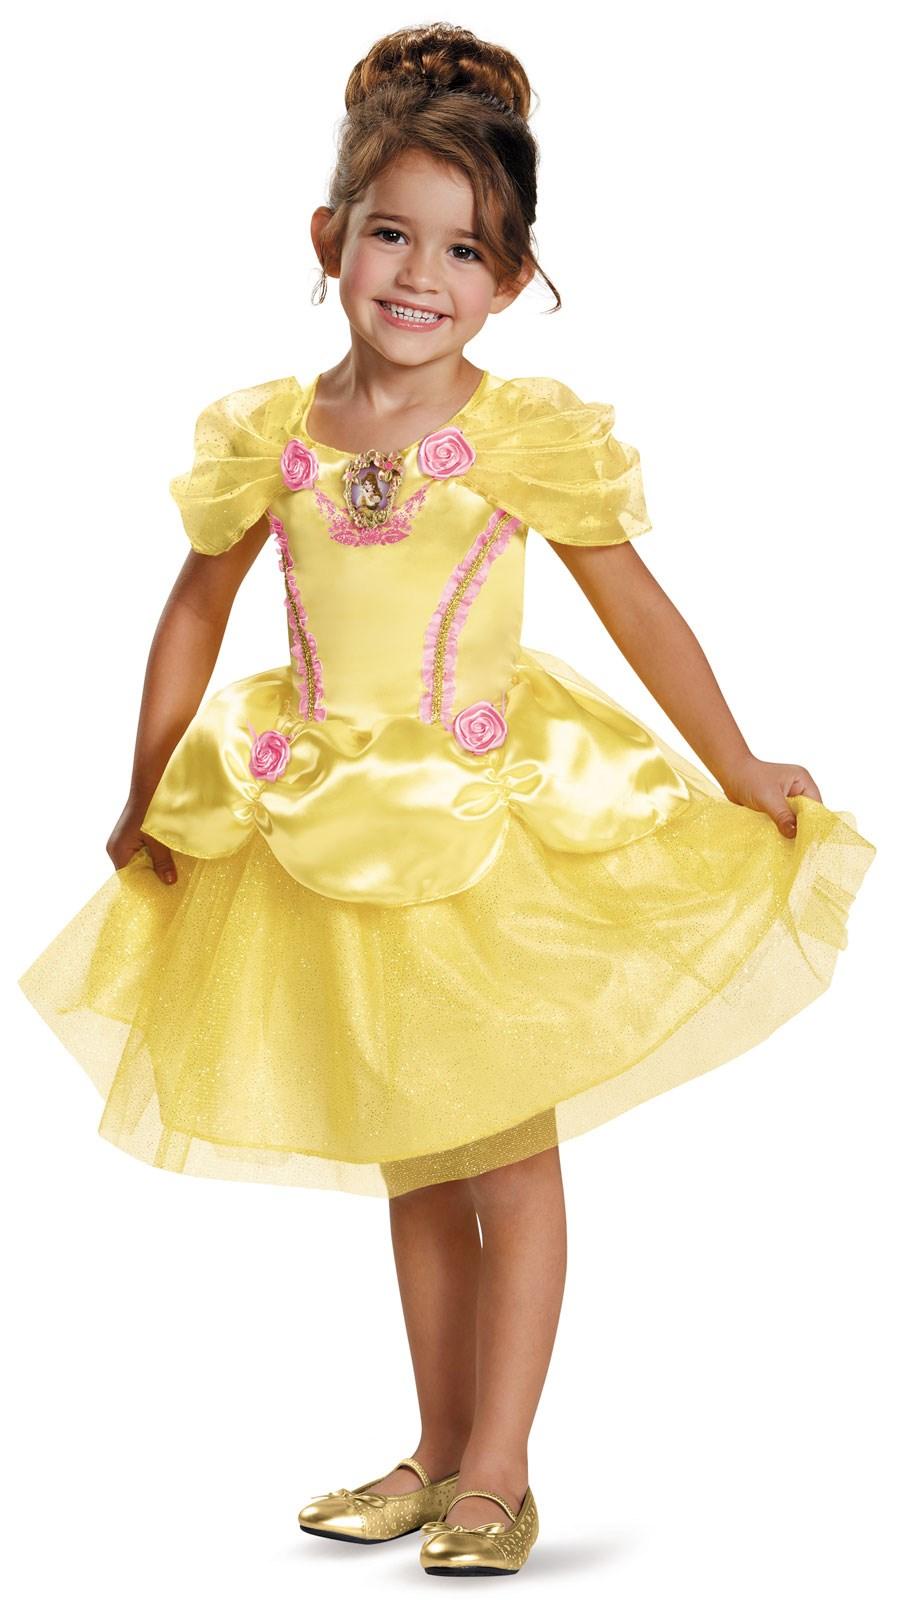 Disney Princess Belle Costumes | BuyCostumes.com